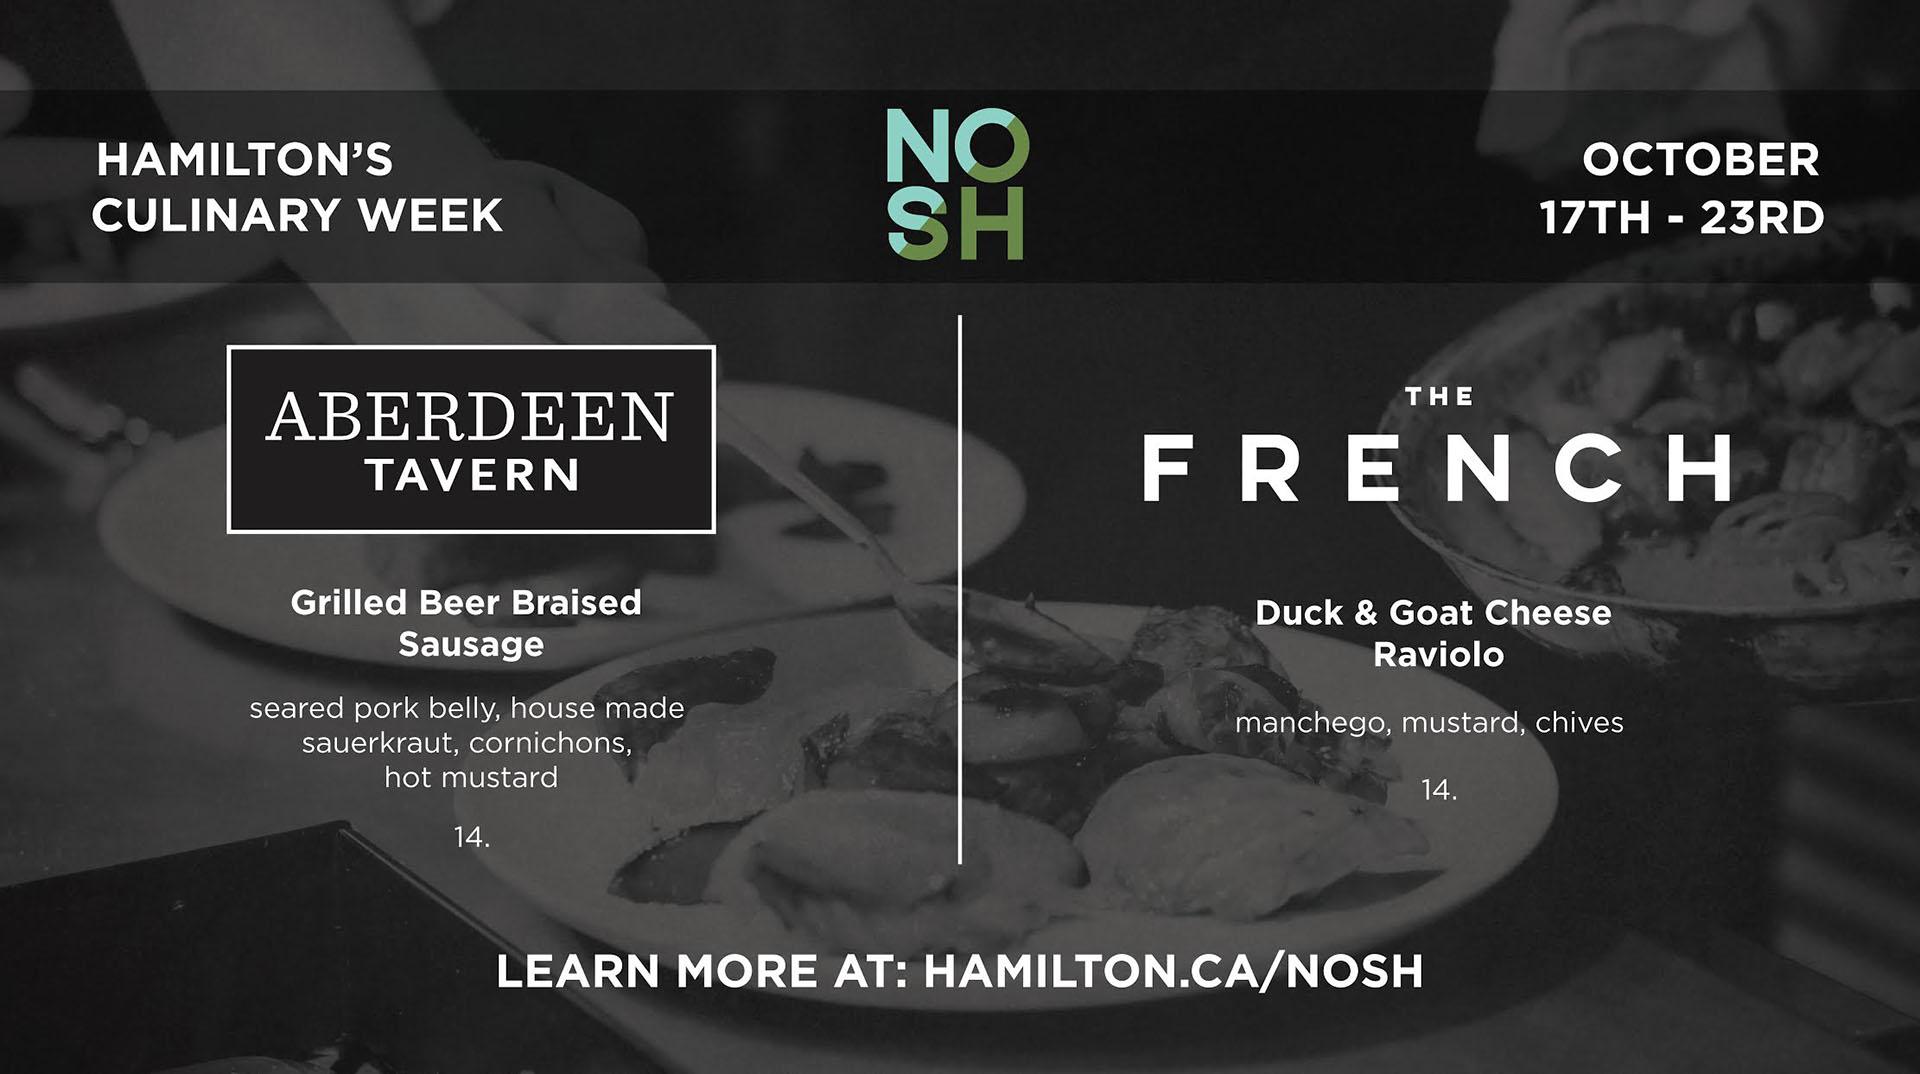 Hamilton Culinary Week